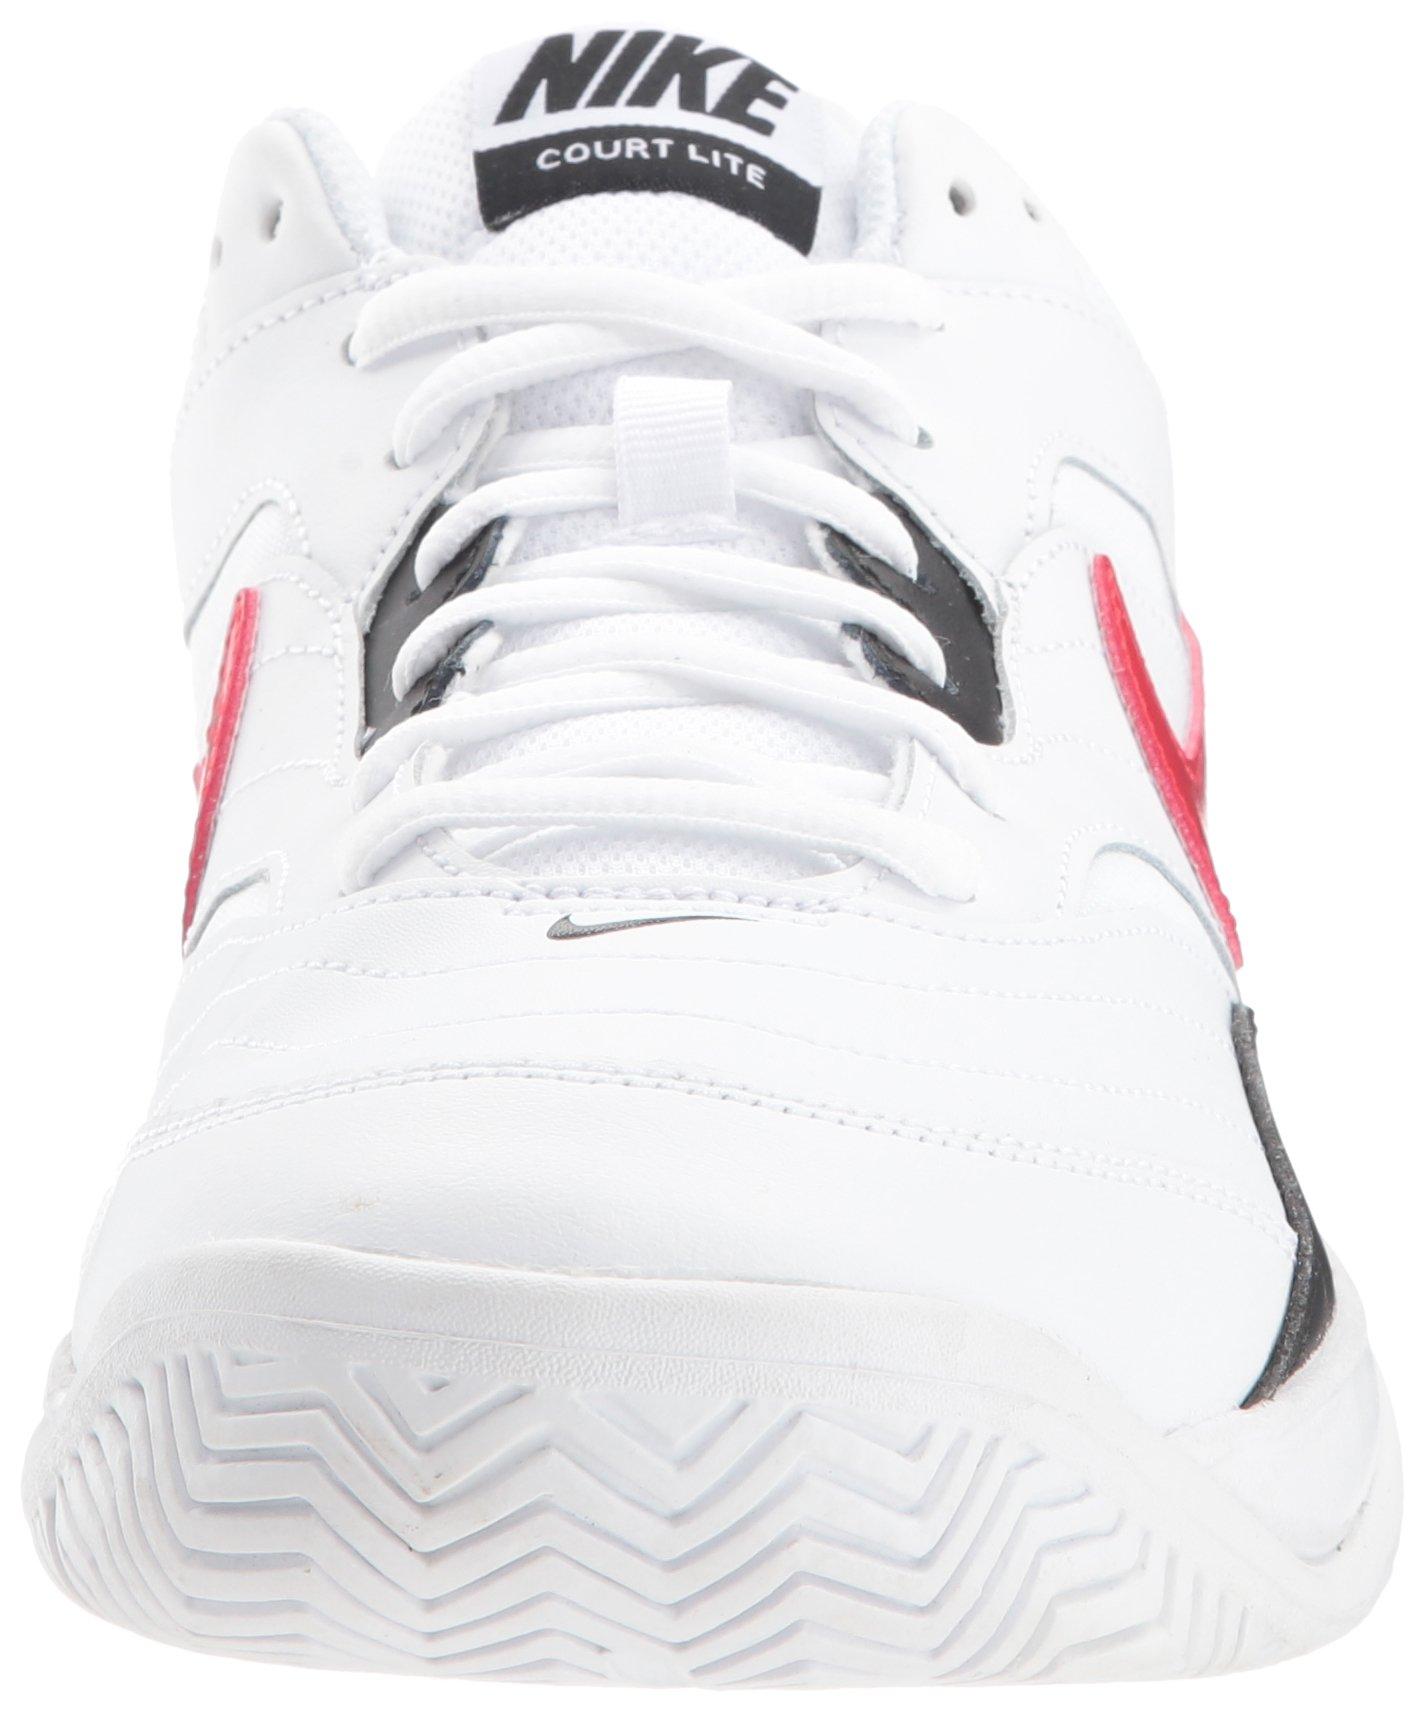 Nike Men's Court Lite Tennis Shoe, White/University red/Black, 7.5 D US by Nike (Image #4)